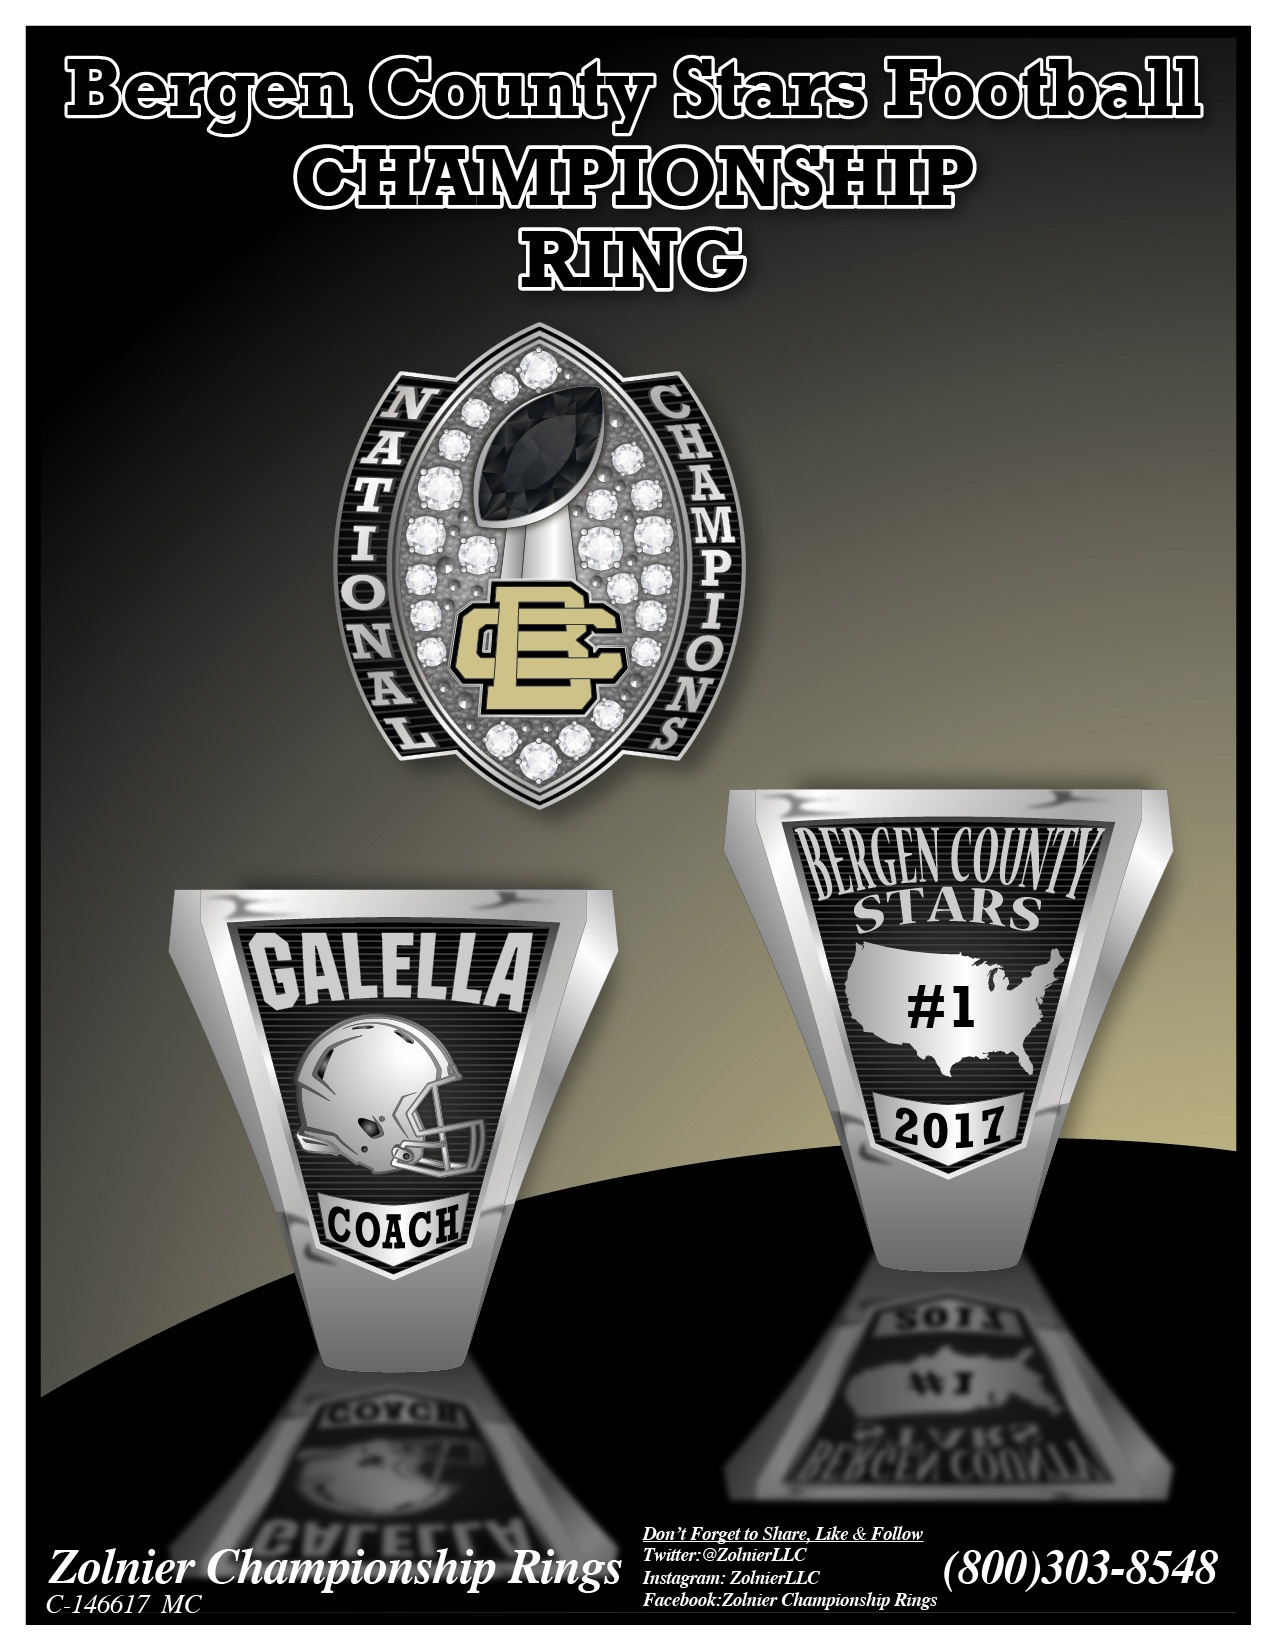 C-146617 Bergen County Stars Football Champ Ring